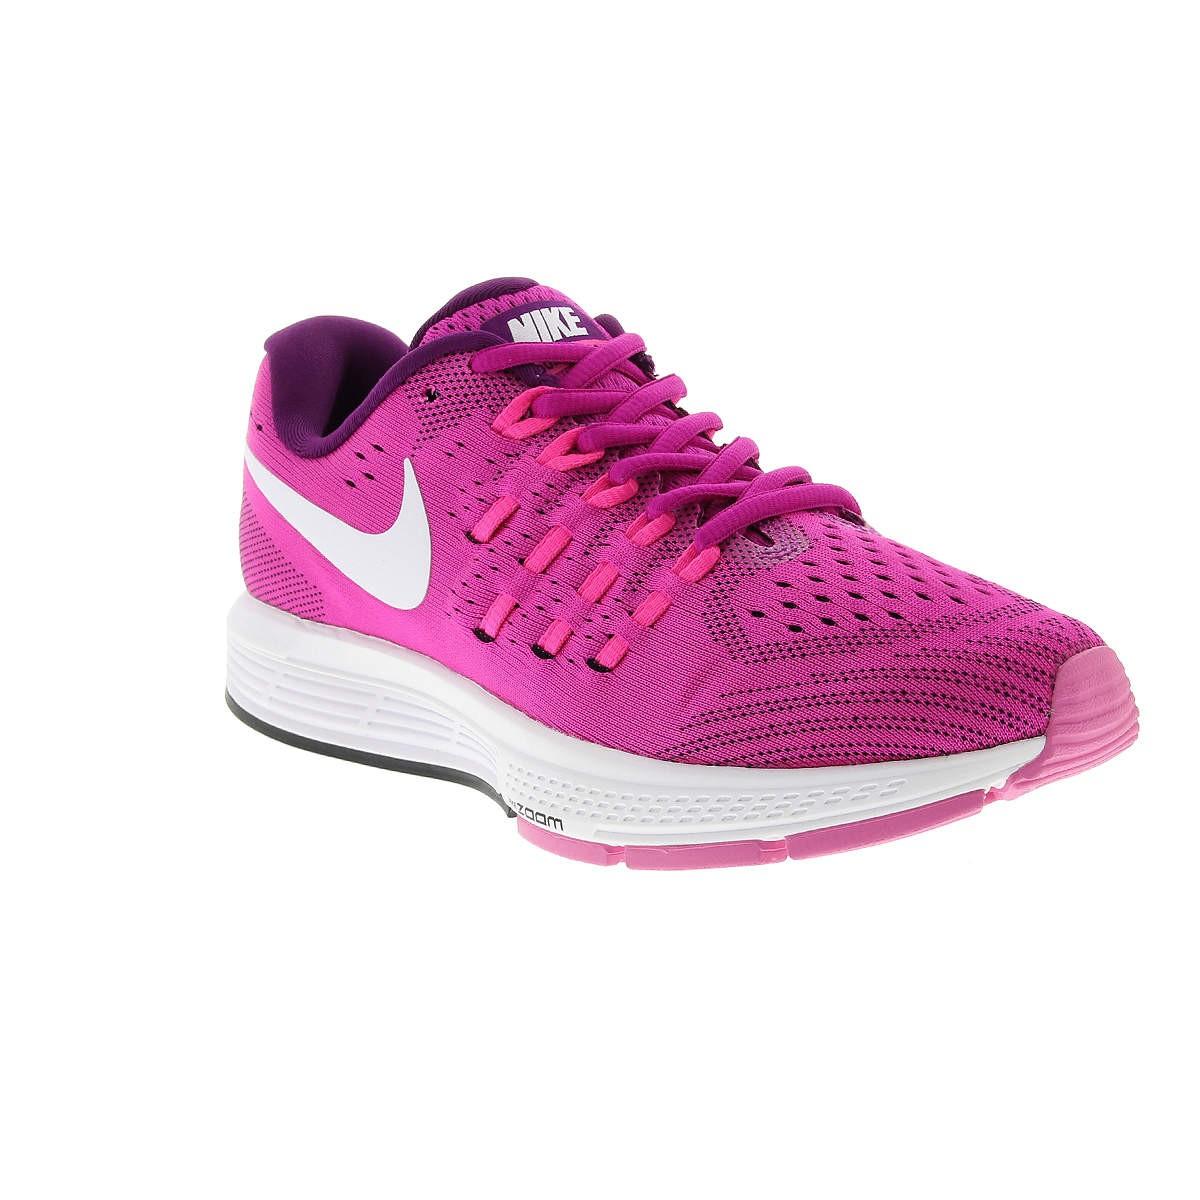 4011465f992 Tênis Nike Air Zoom Vomero 11 818100-602 Roxo Branco